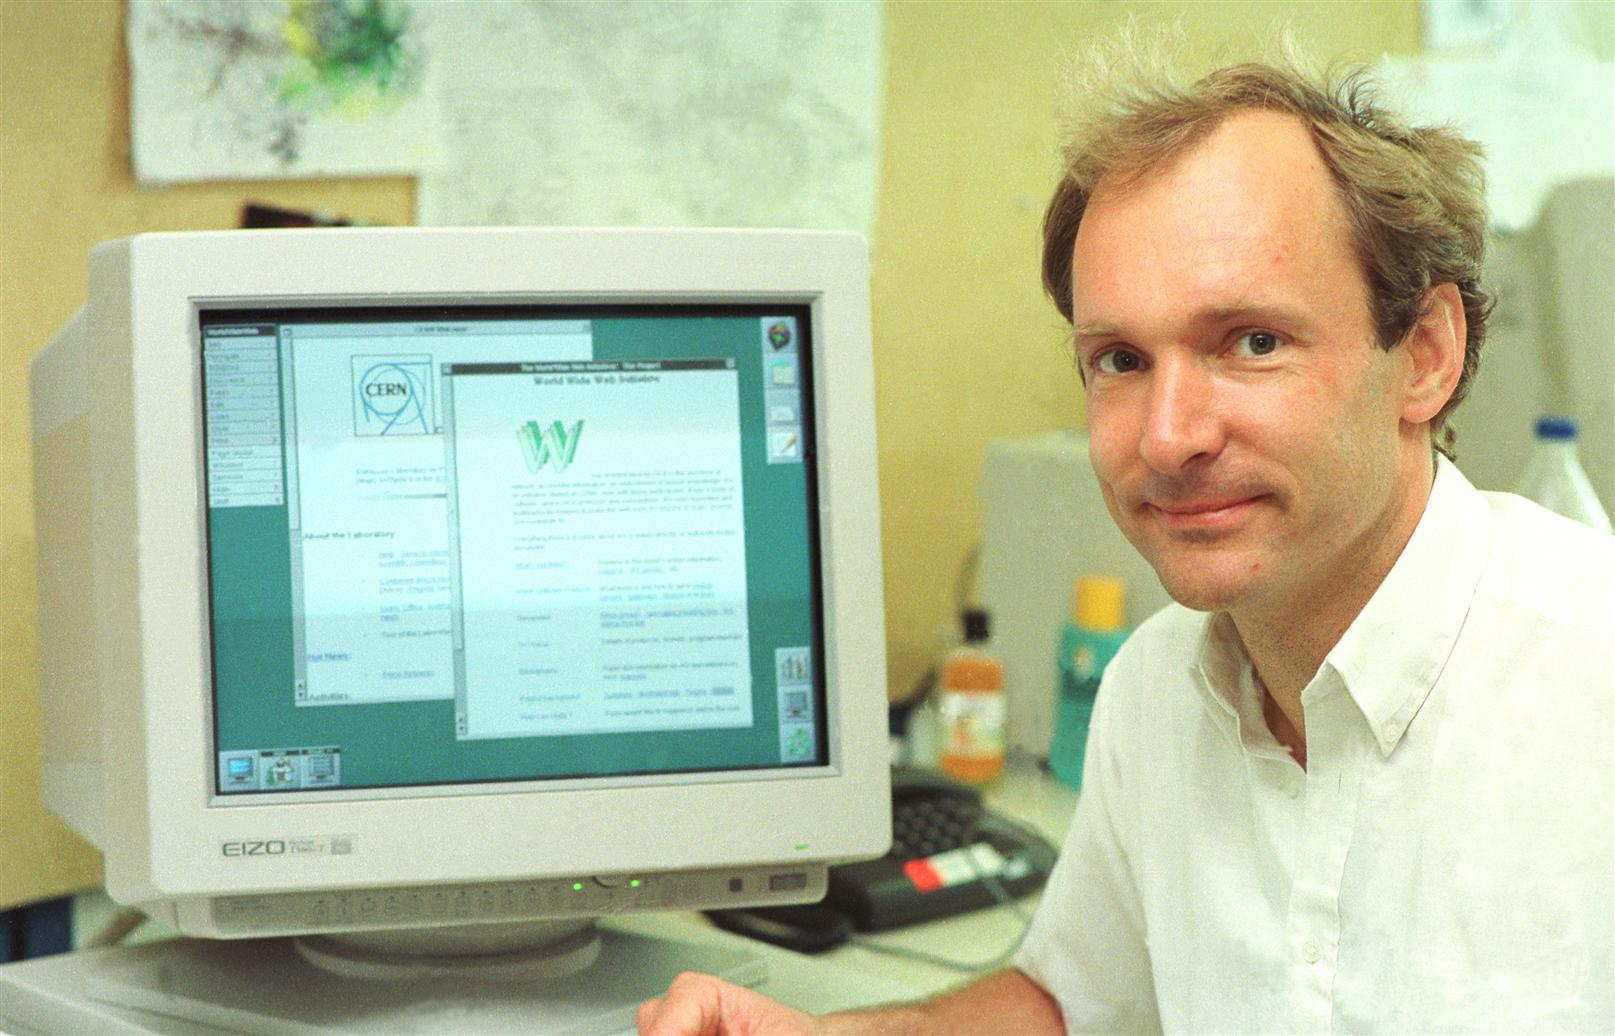 Tim Berners-Lee founder of www